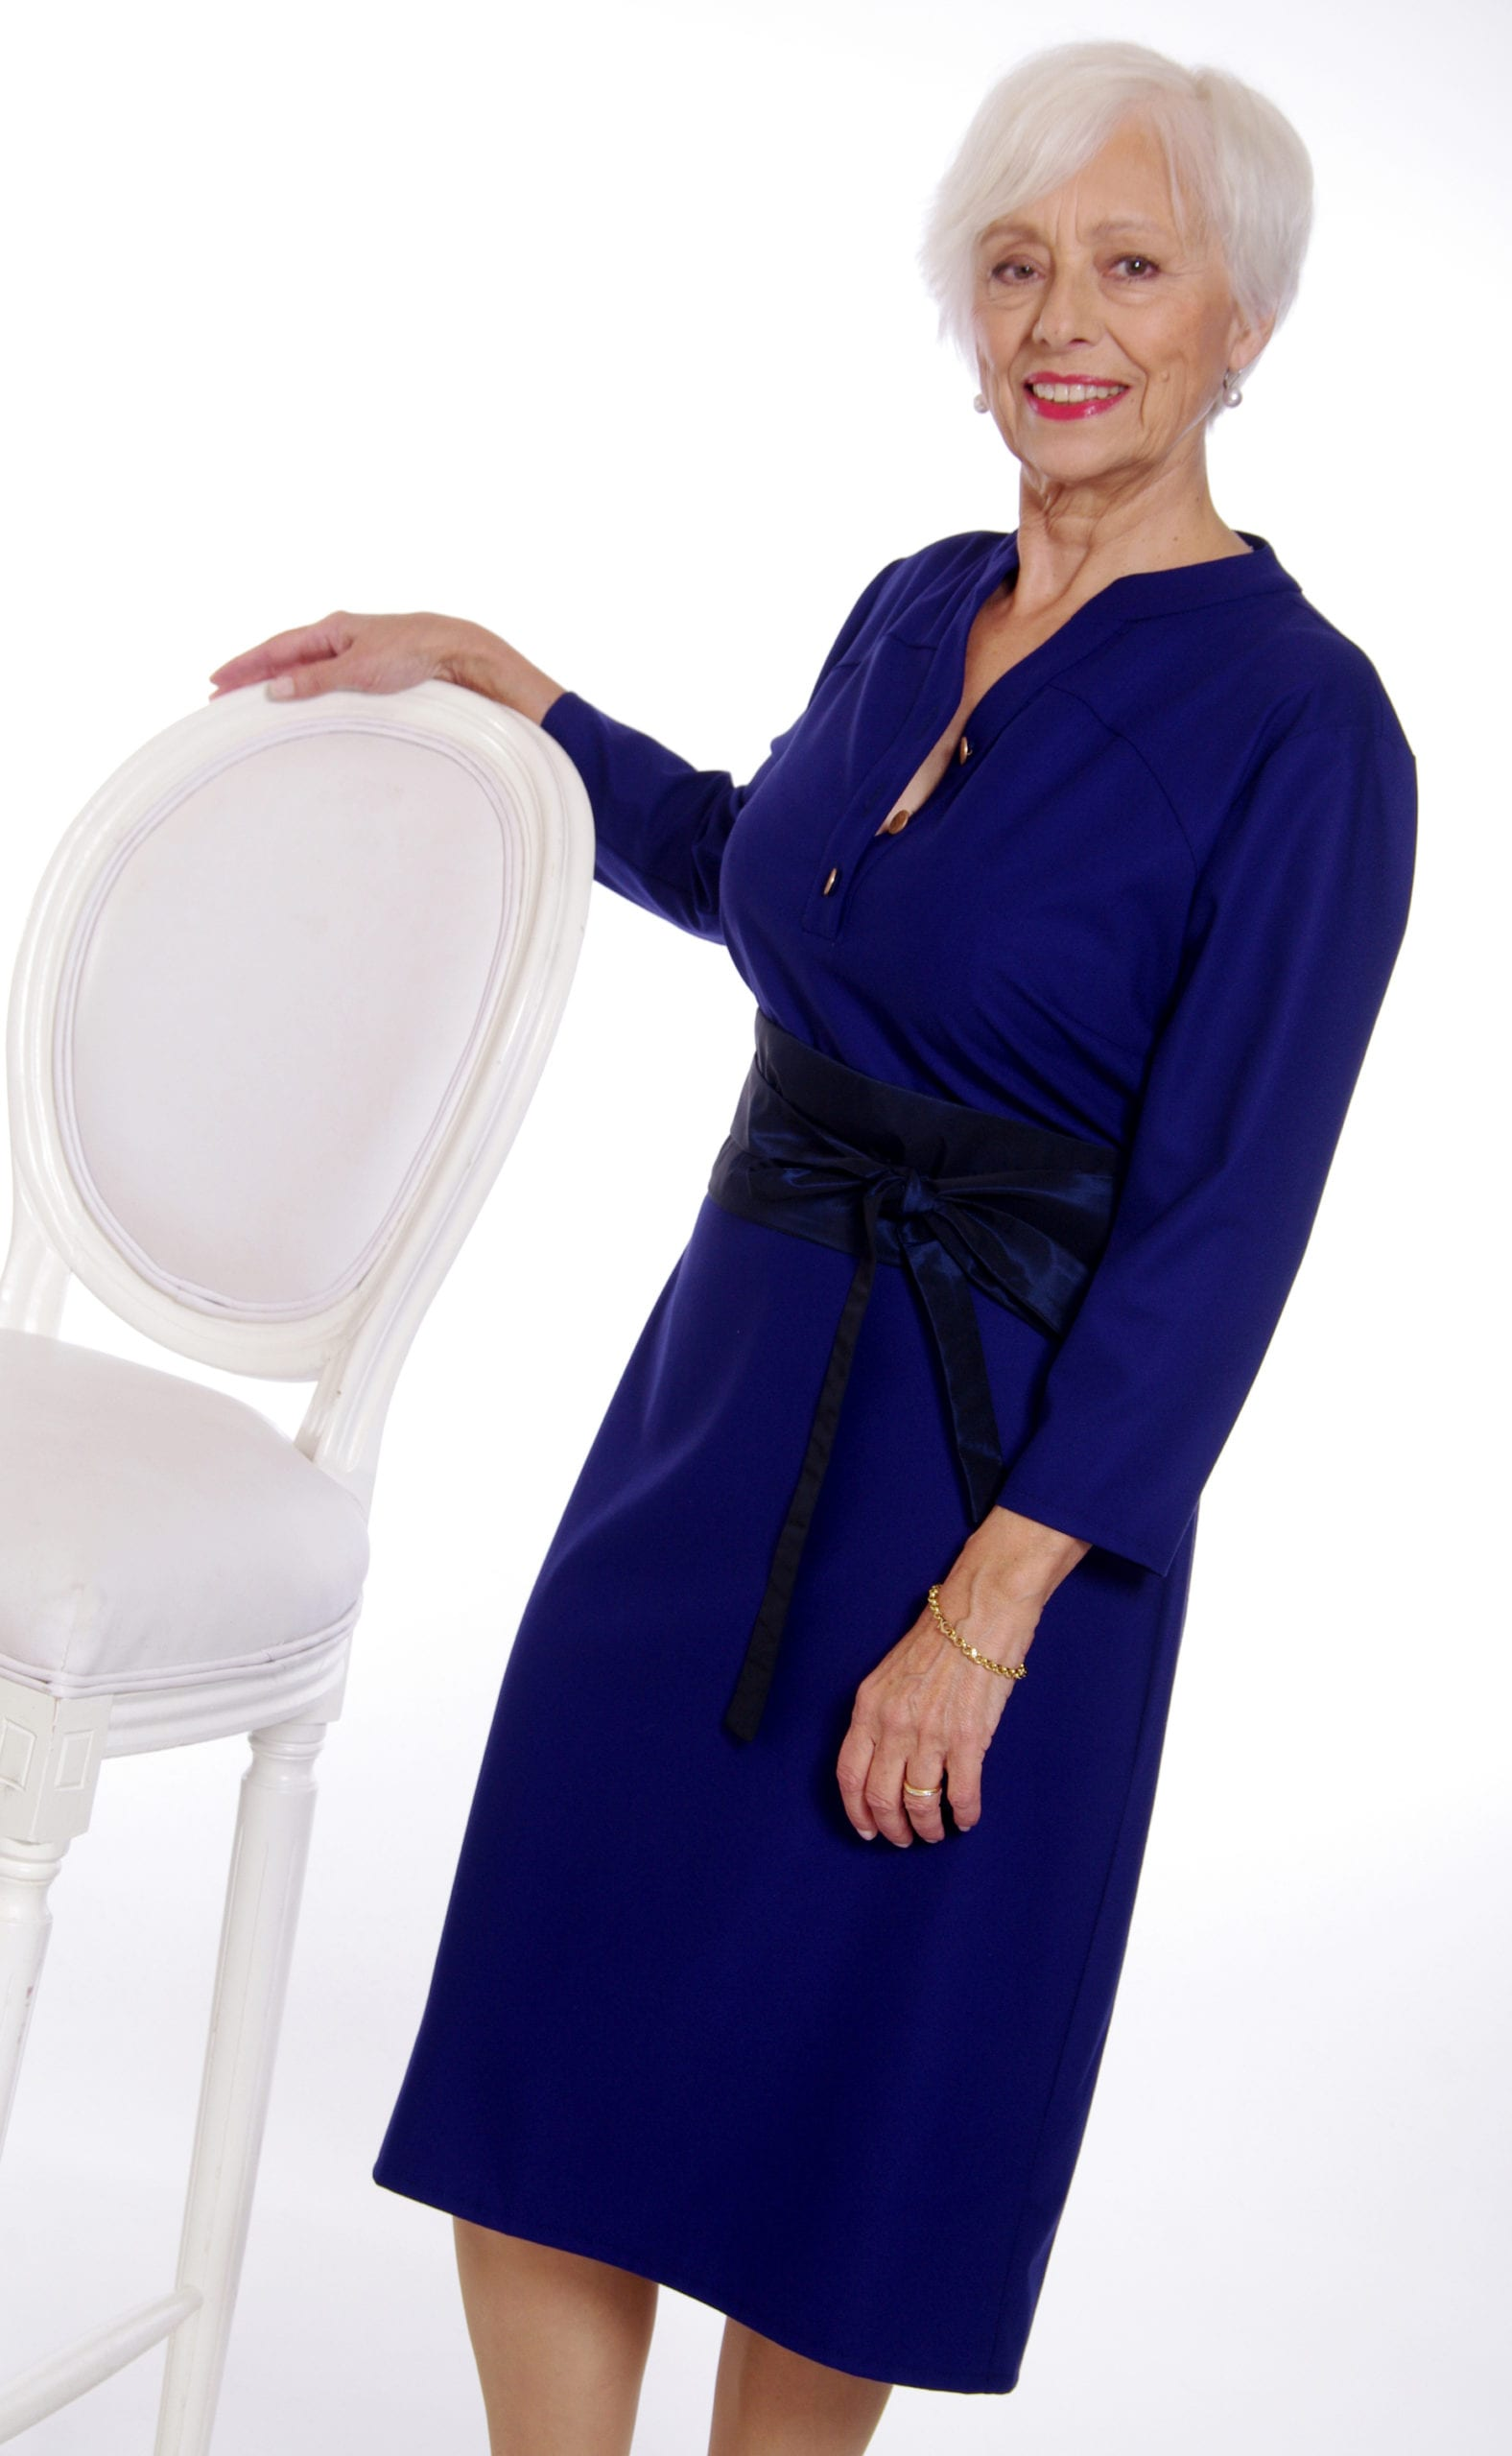 pour choisir une robe robe pour femme agee. Black Bedroom Furniture Sets. Home Design Ideas